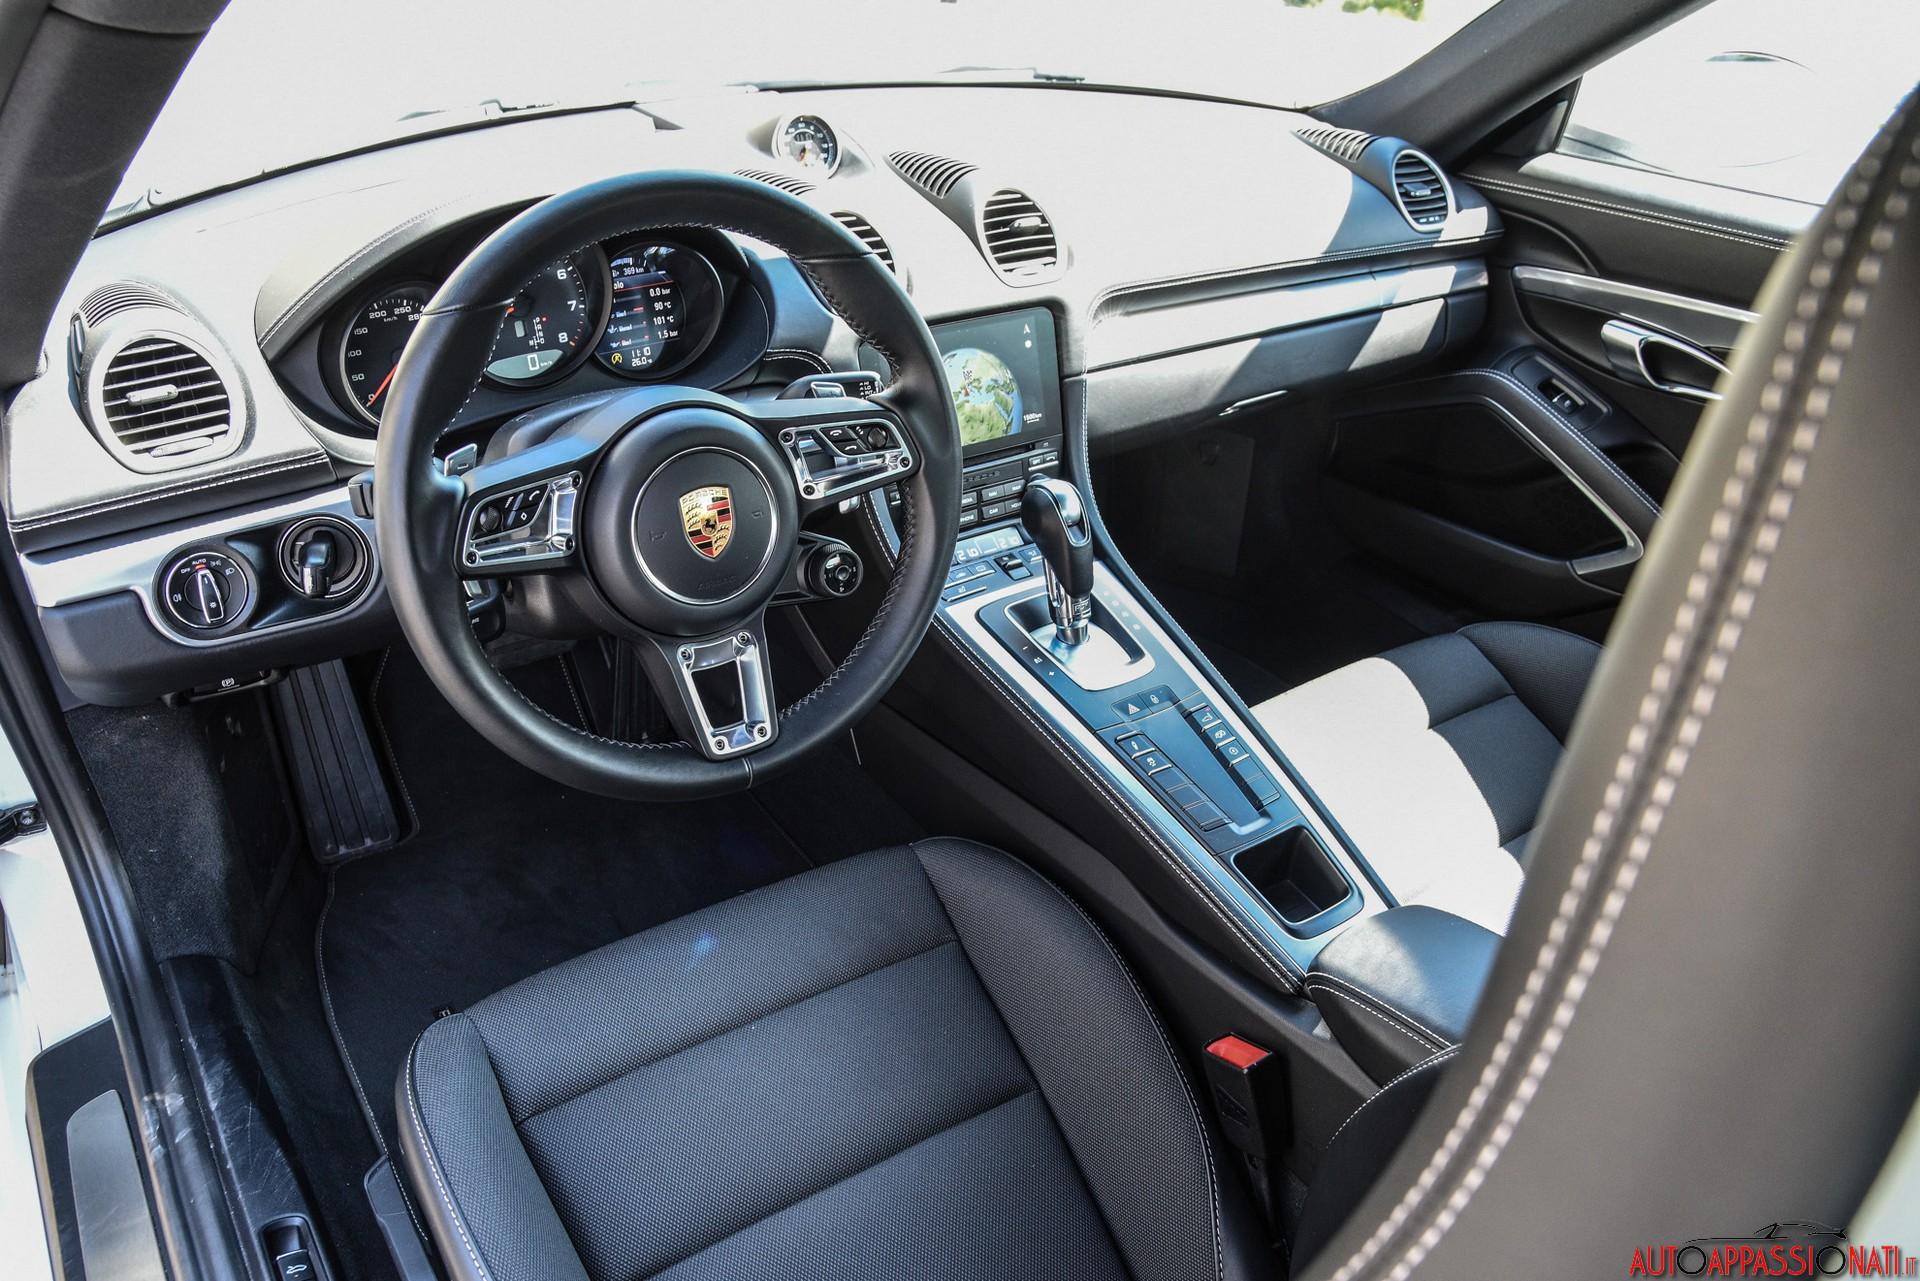 Porsche 718 Cayman interni